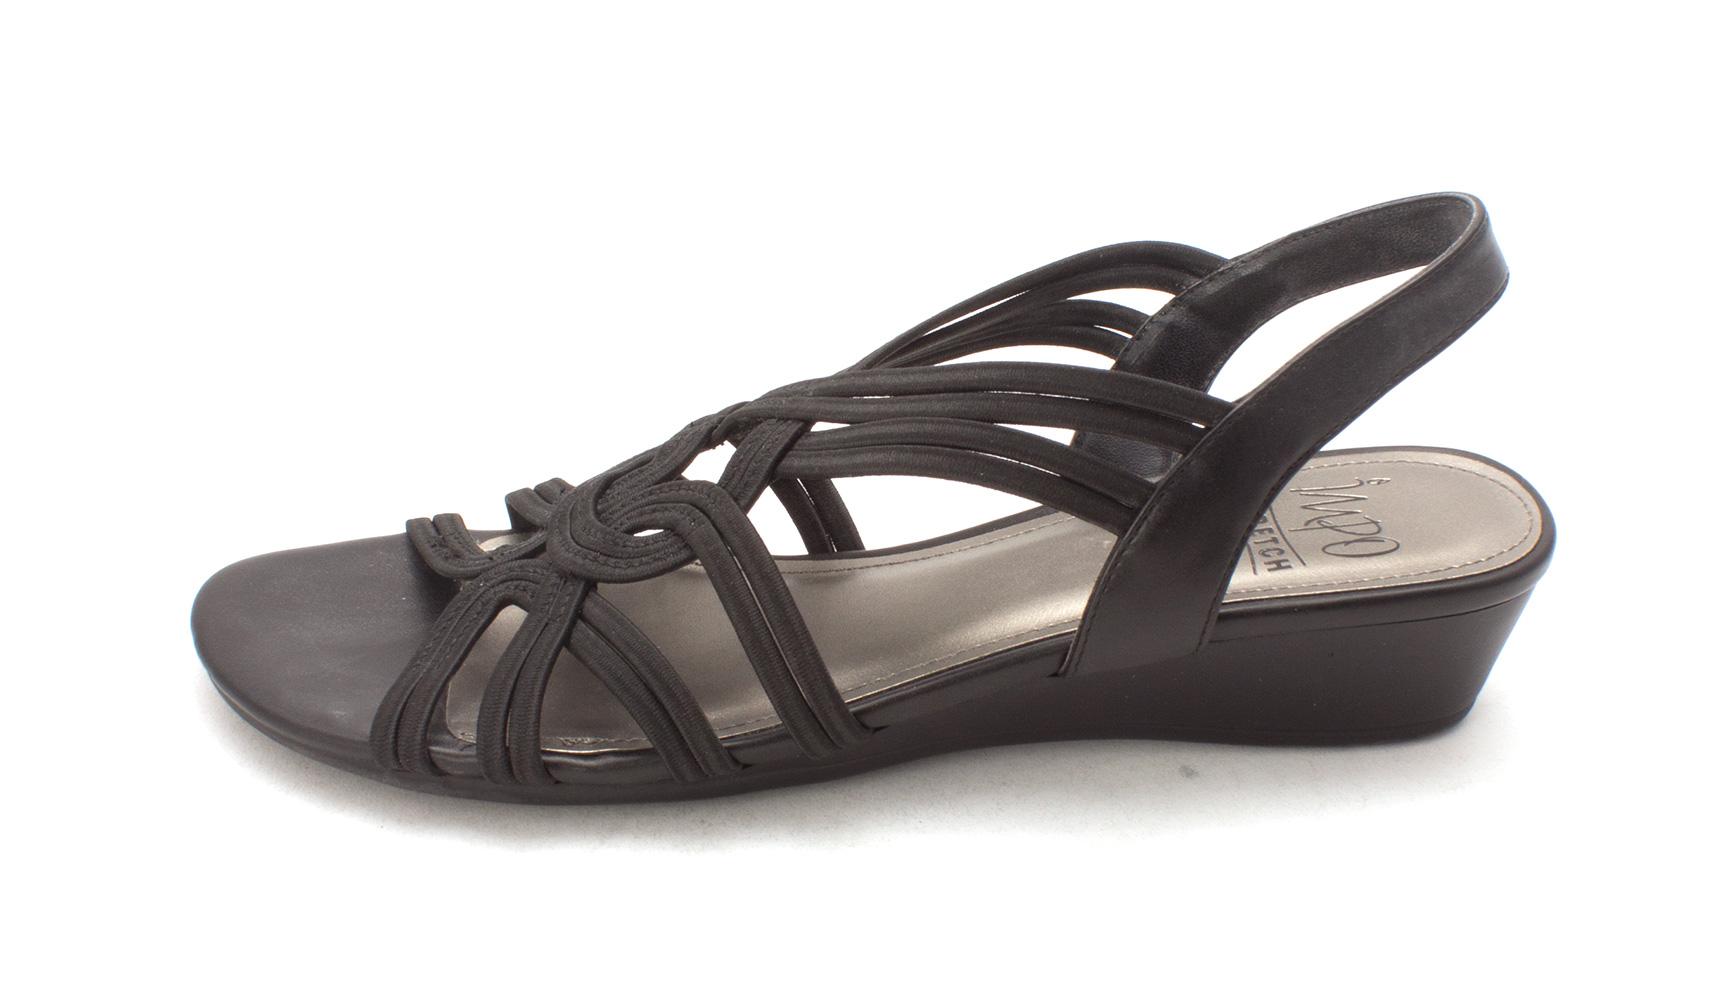 34d05d64496a4 Details about Impo Womens Ruby Open Toe Casual Platform Sandals